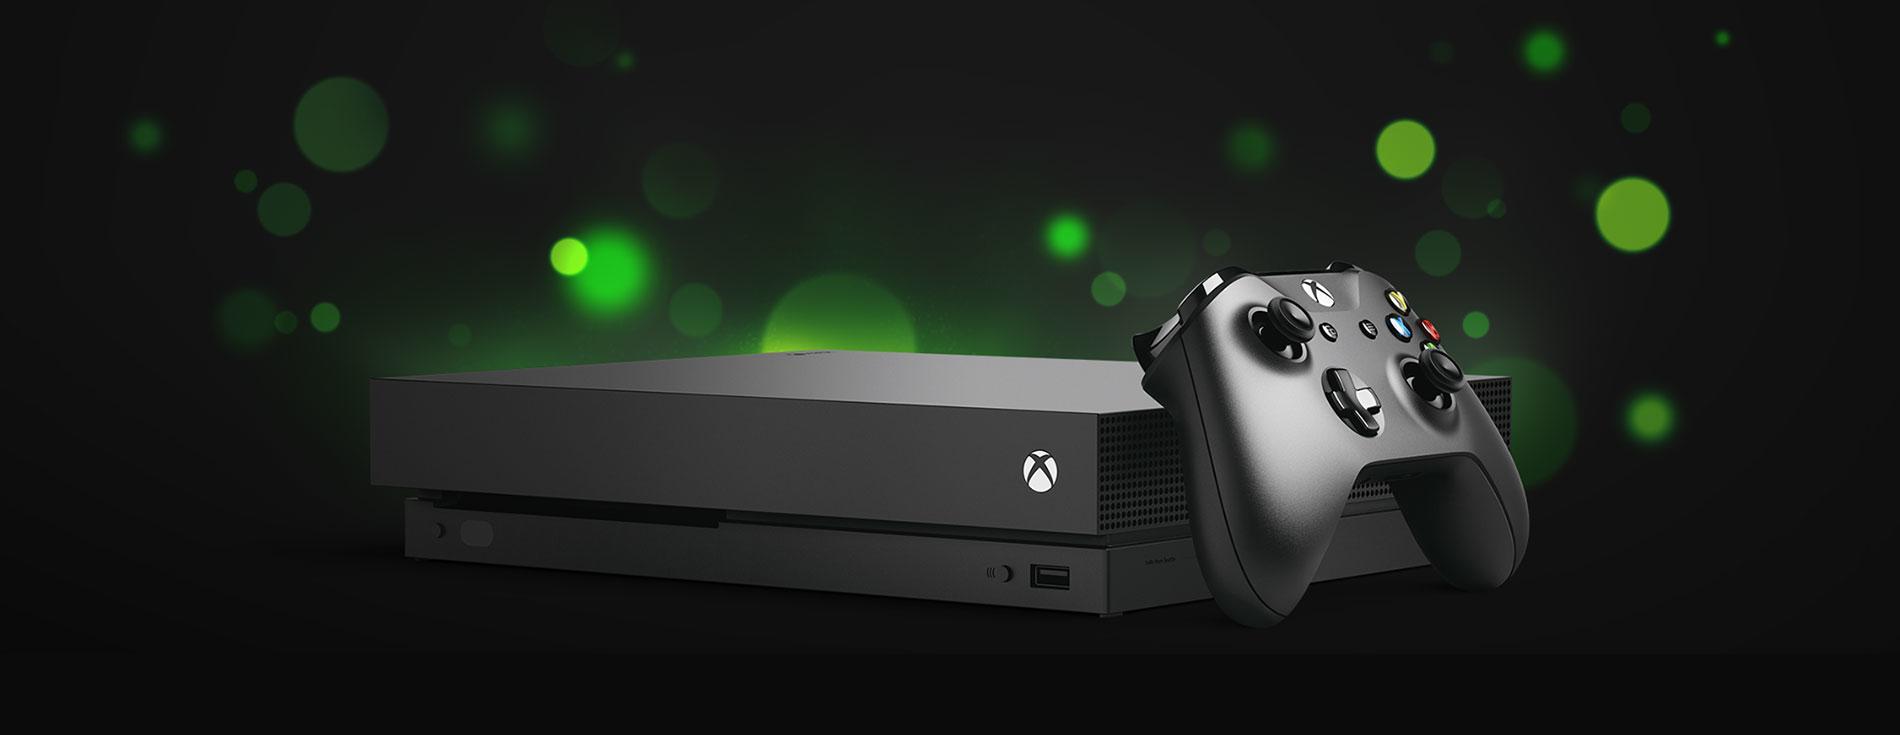 Xbox One X будет популярен